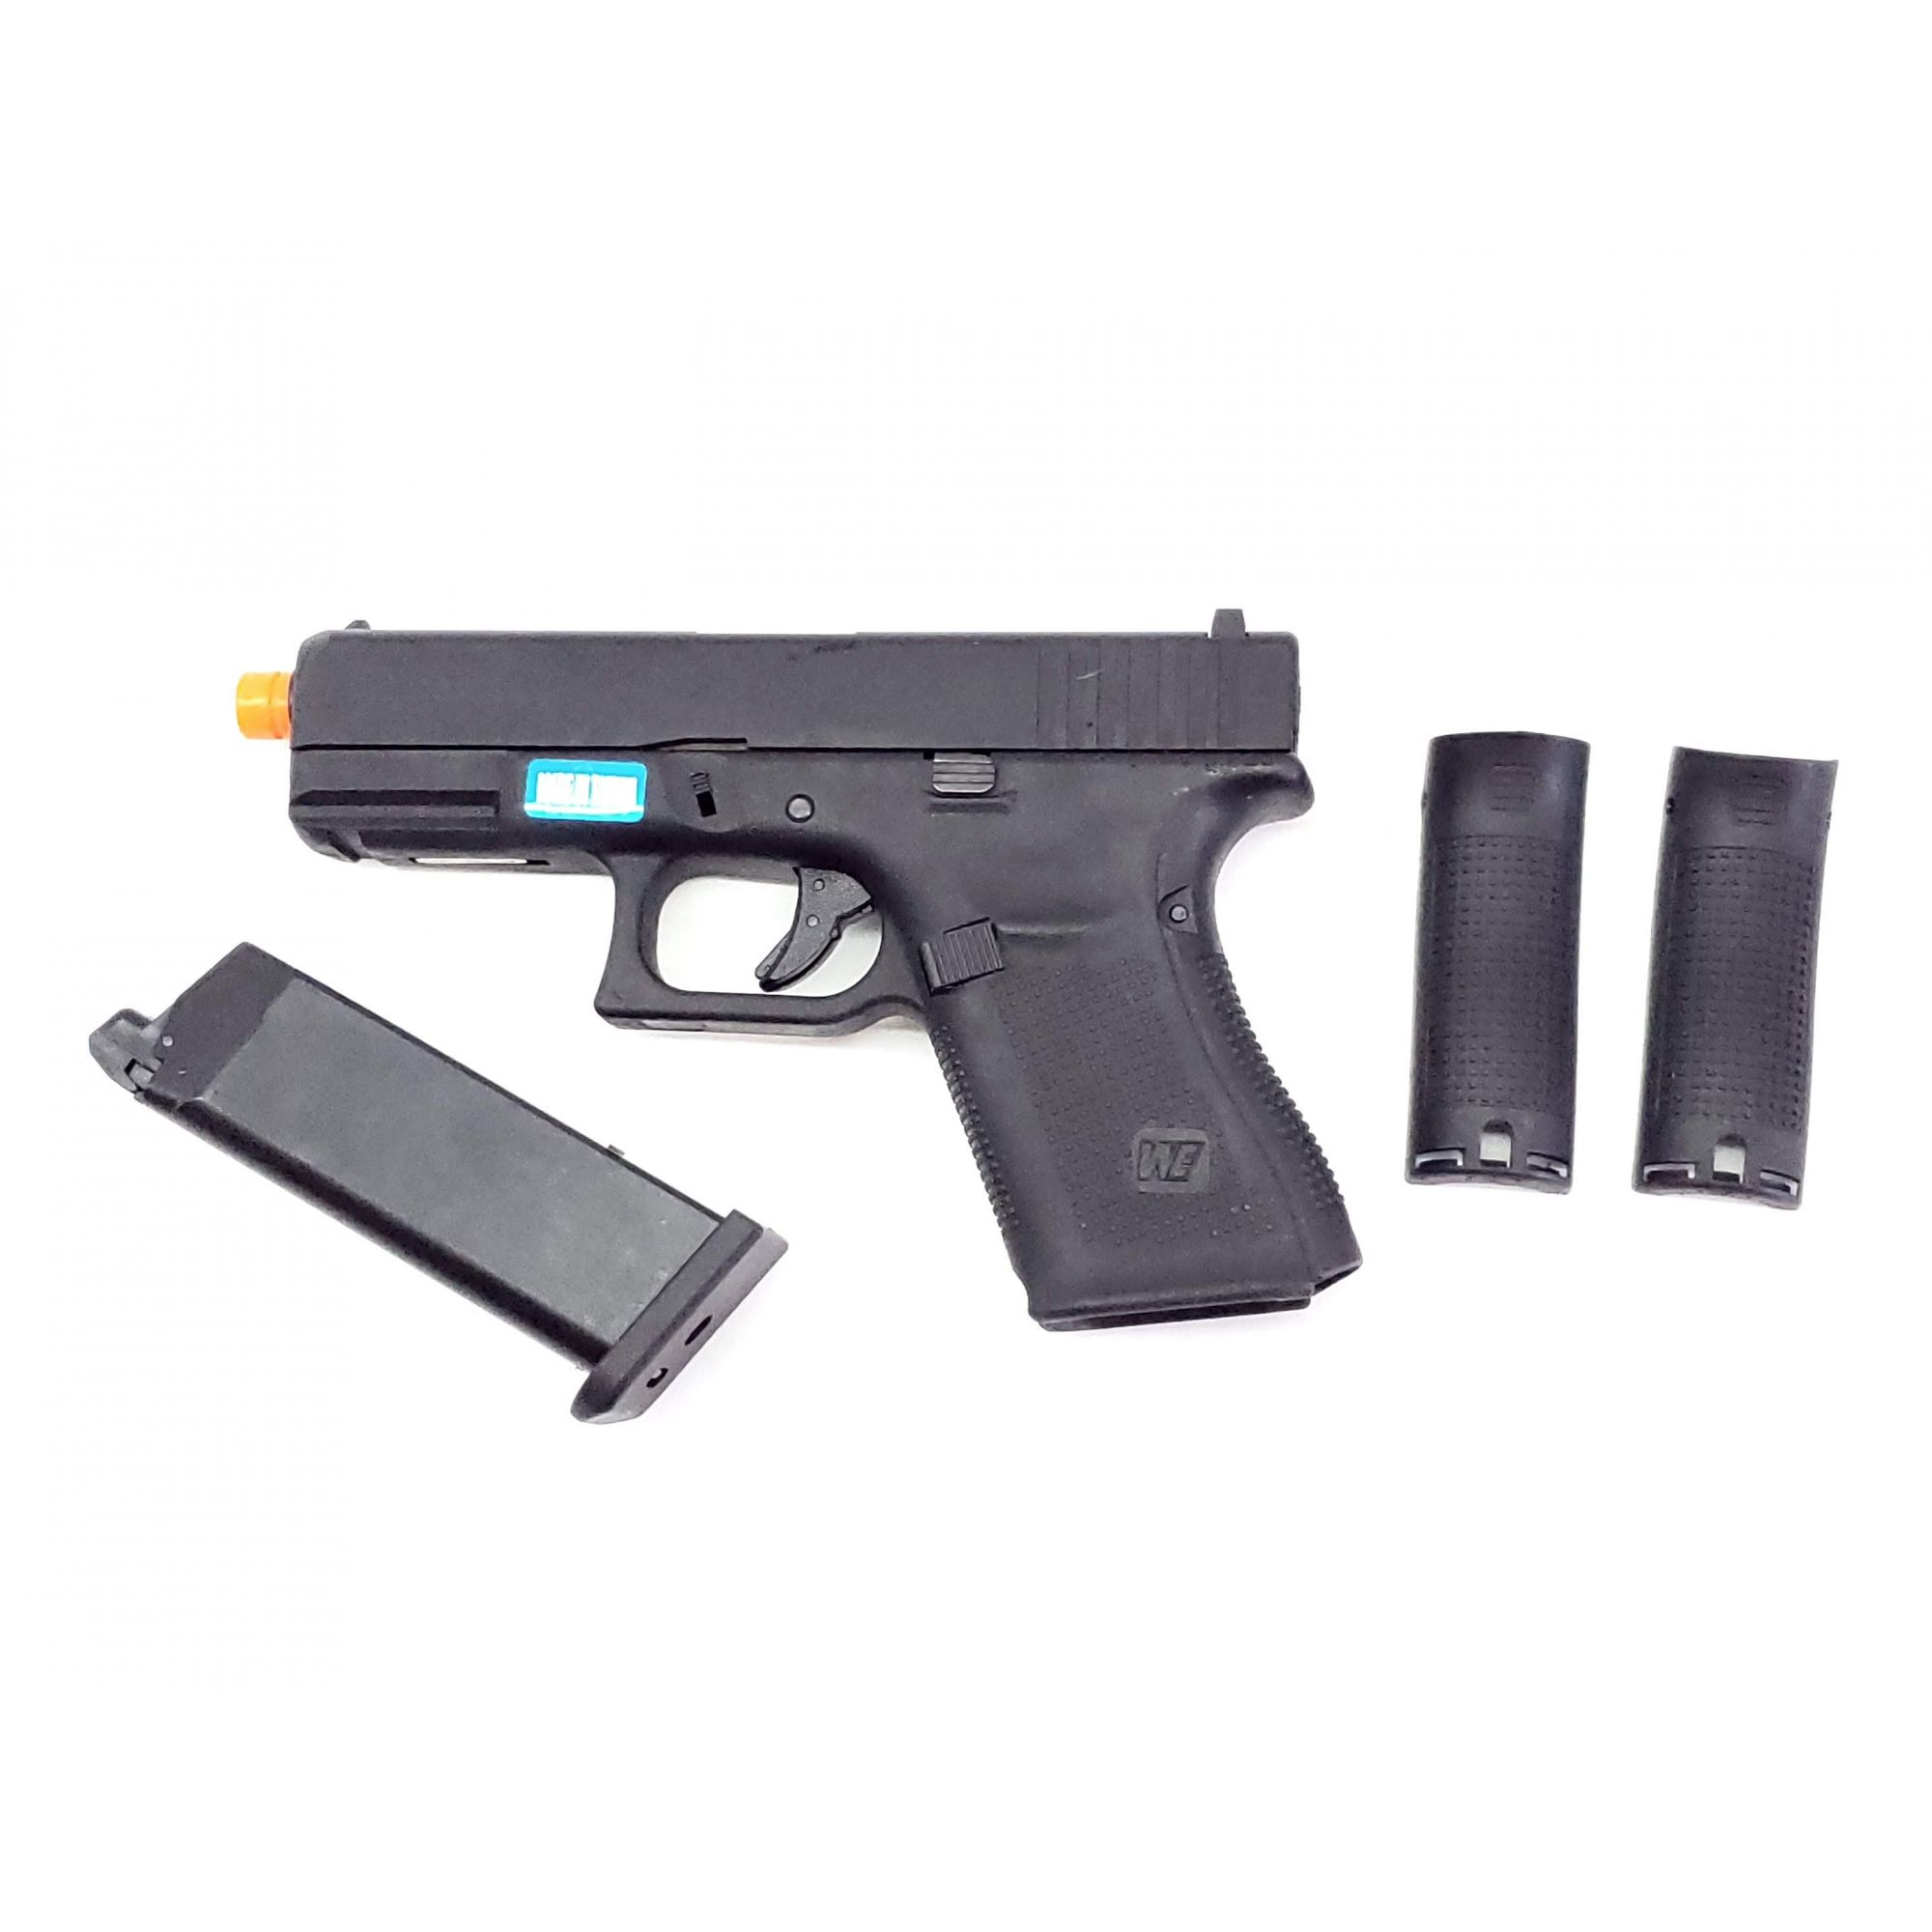 Pistola Airsoft WE Glock G19 Gen5 Mesmo Tamanho G25